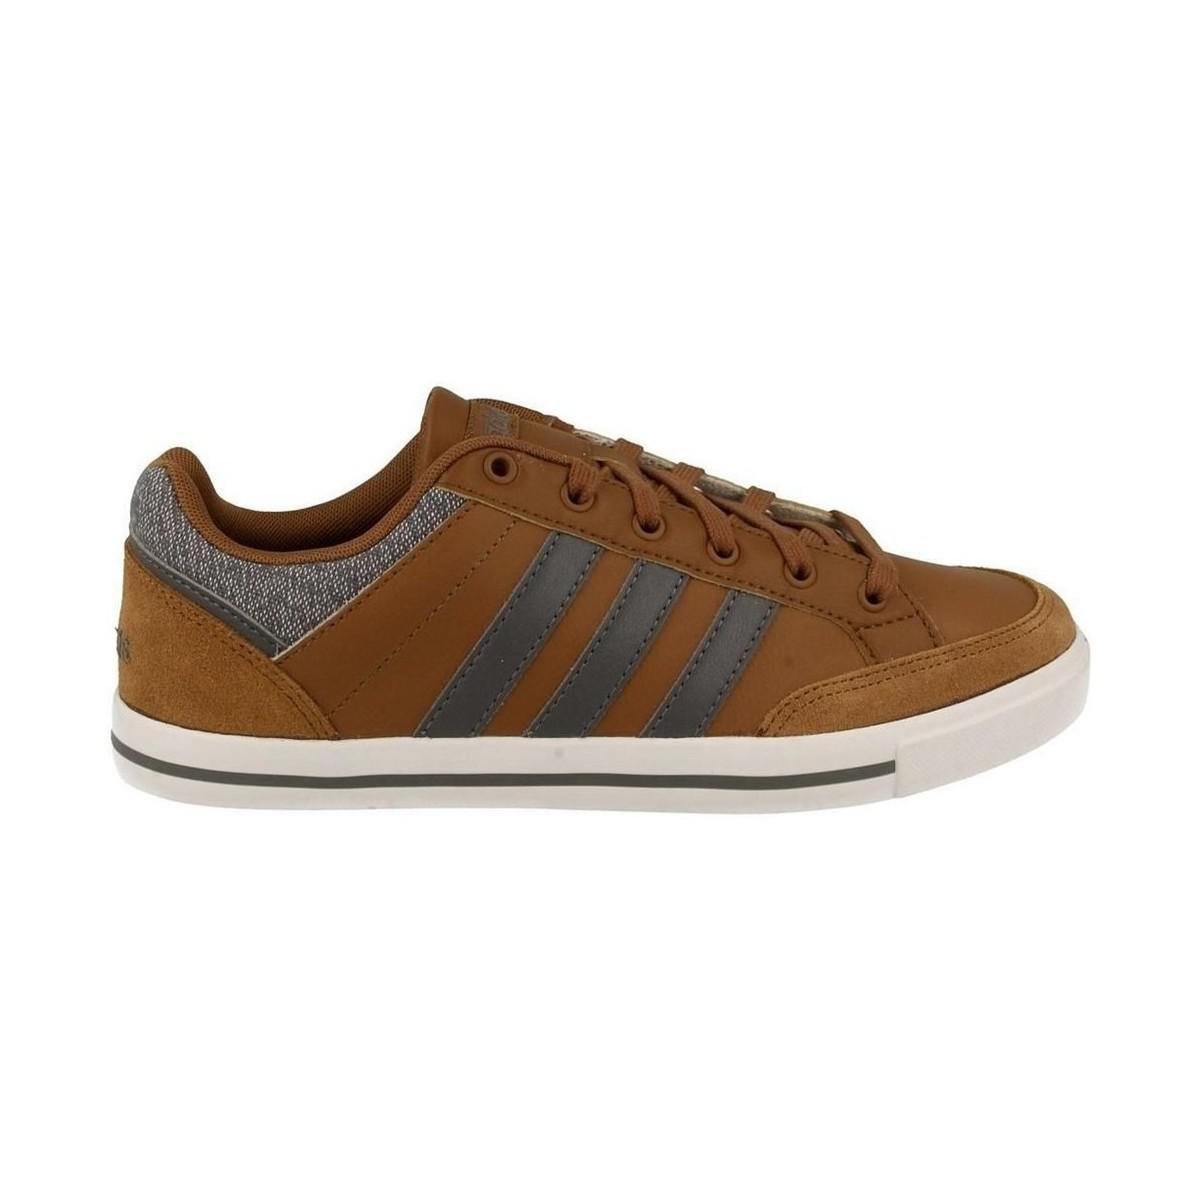 brown adidas neo trainers off 65% - www.ncccc.gov.eg